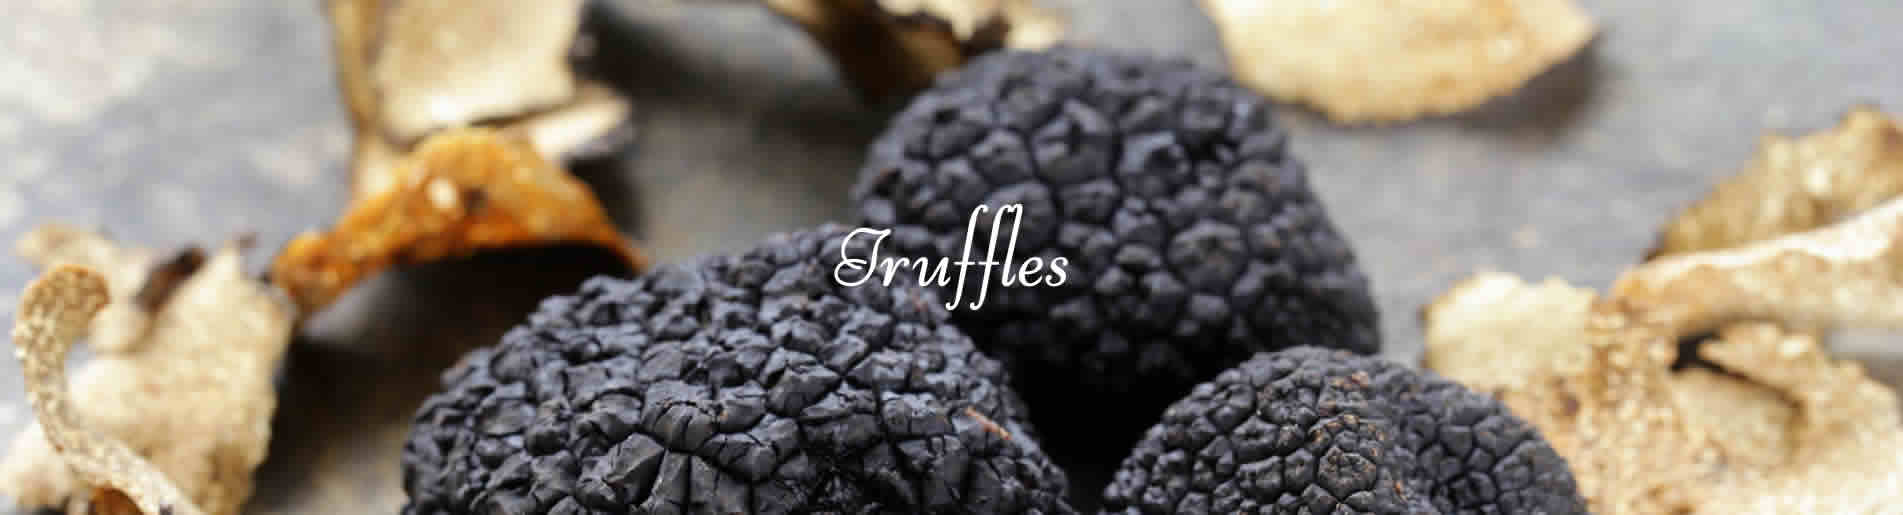 Buy truffles online